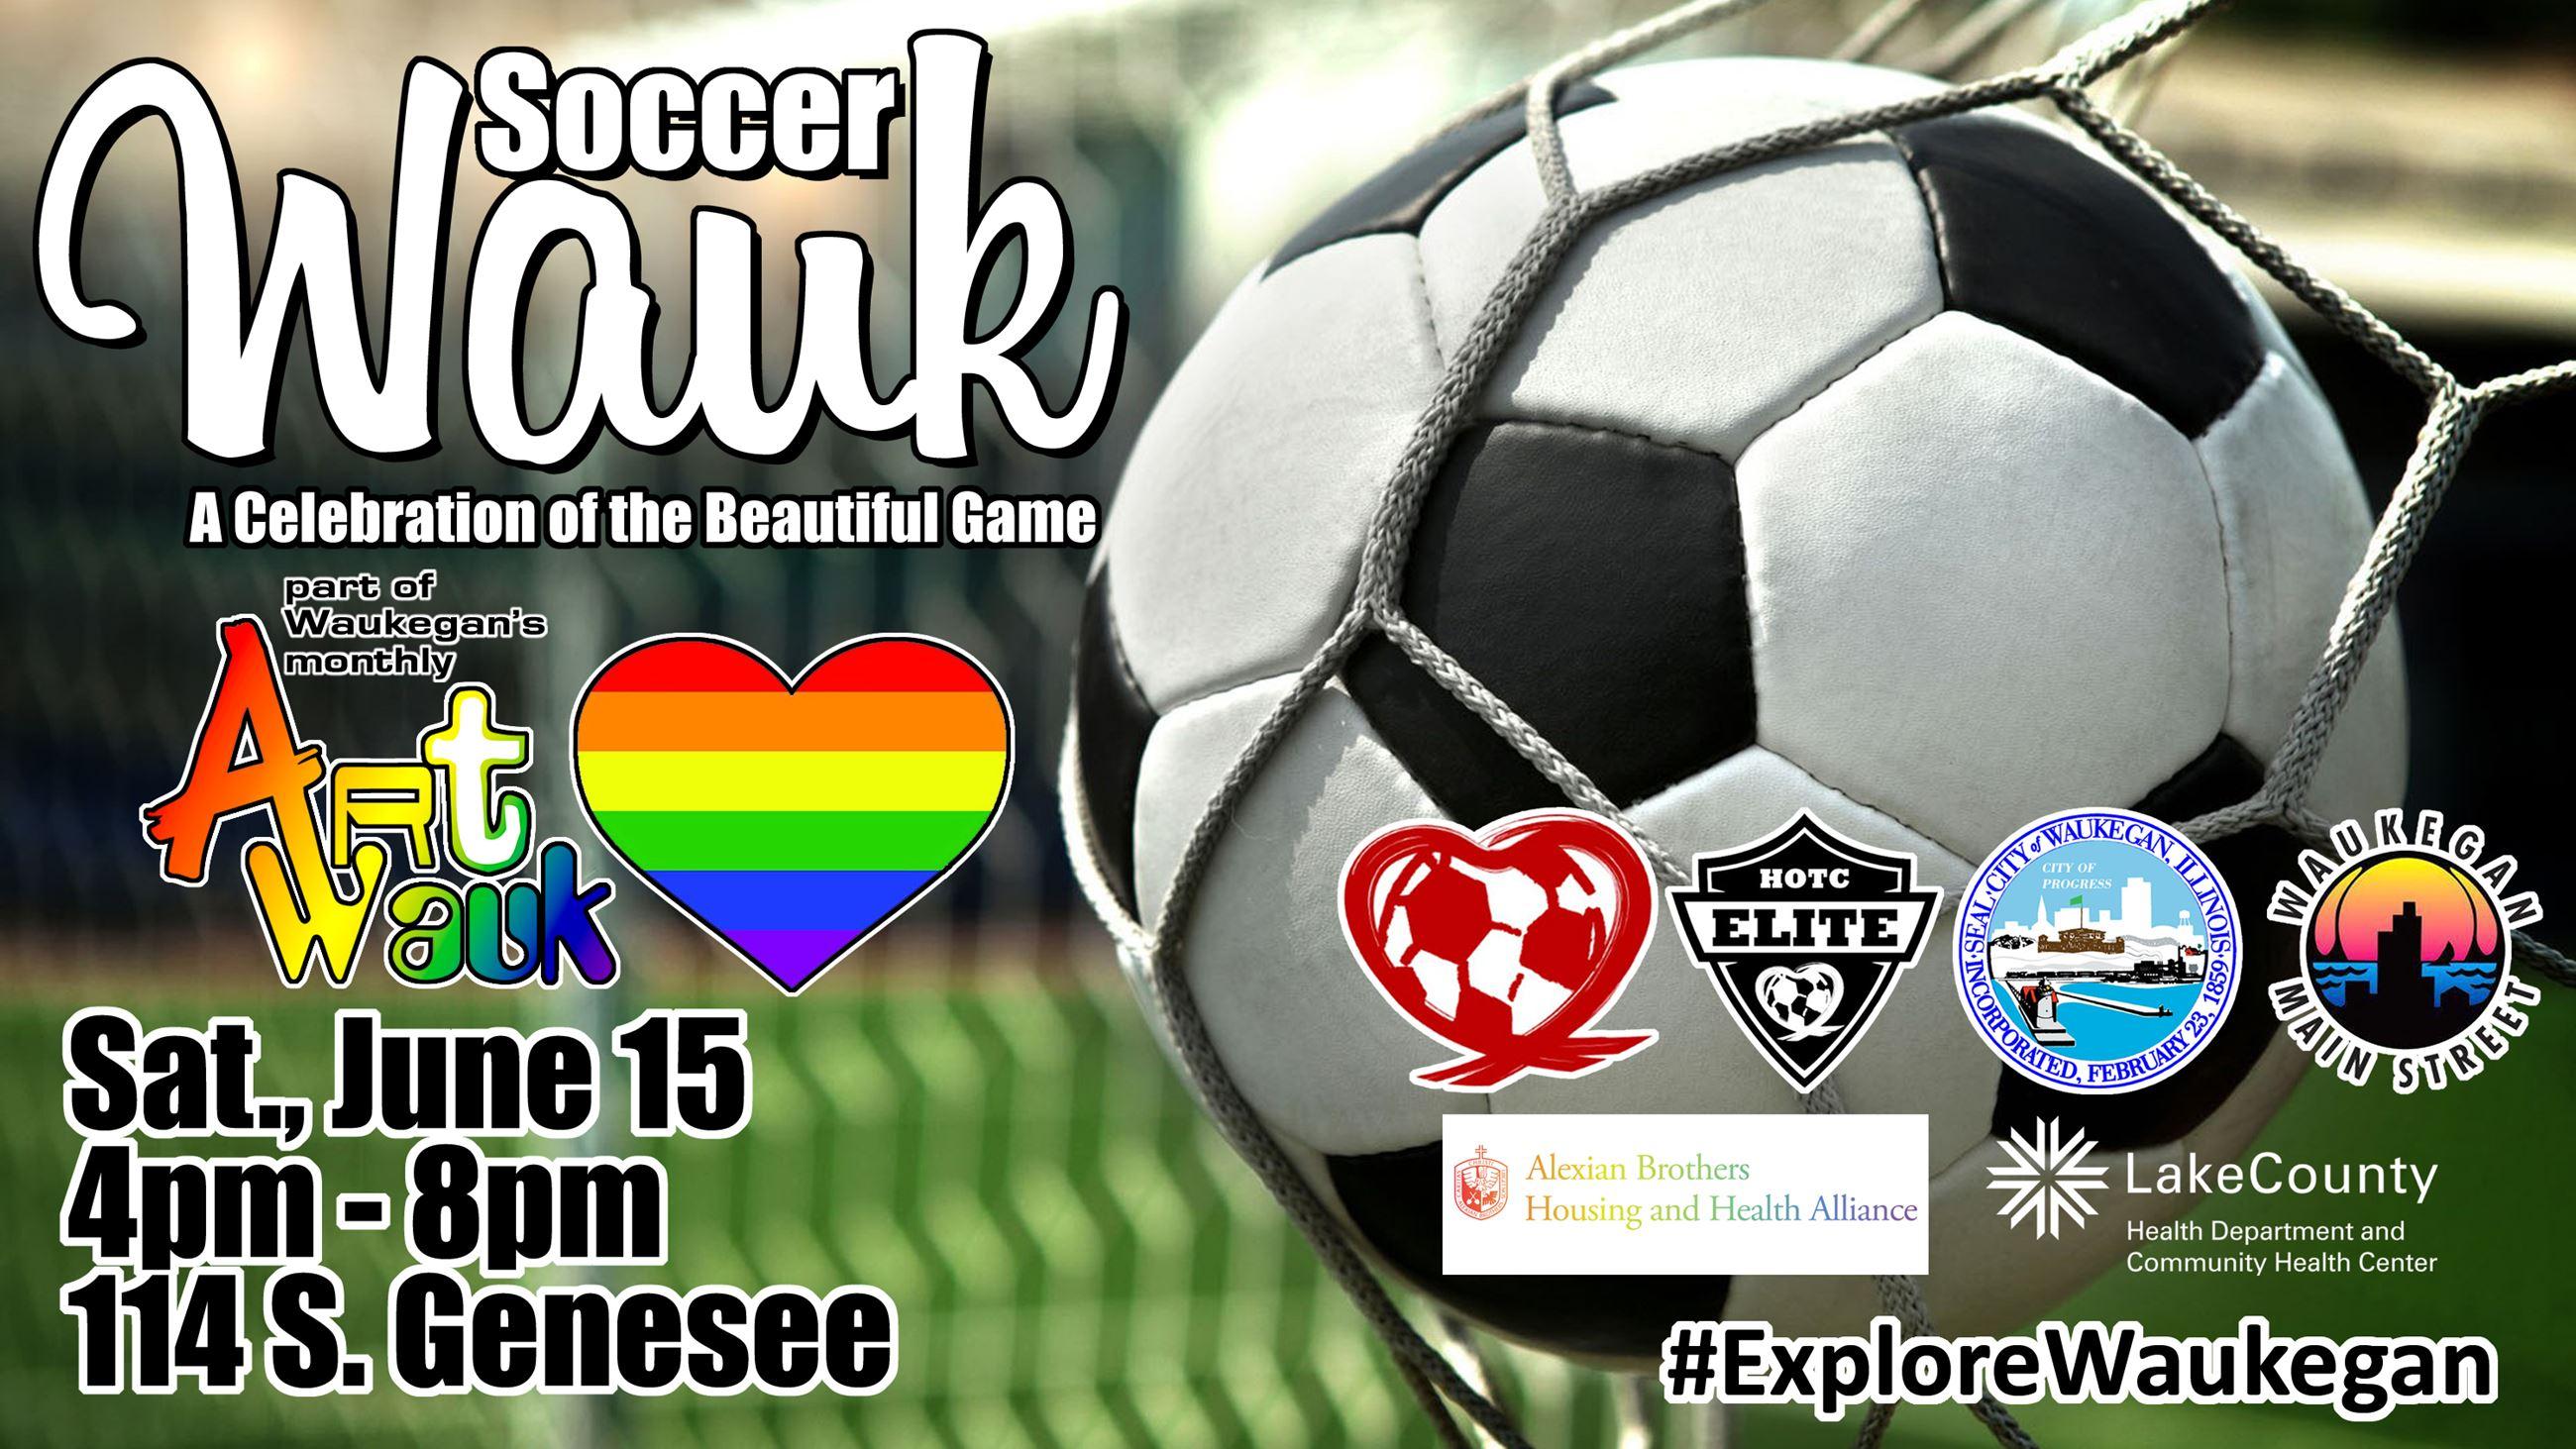 Lake County, Illinois, CVB - - ArtWauk/PrideWauk/SoccerWauk